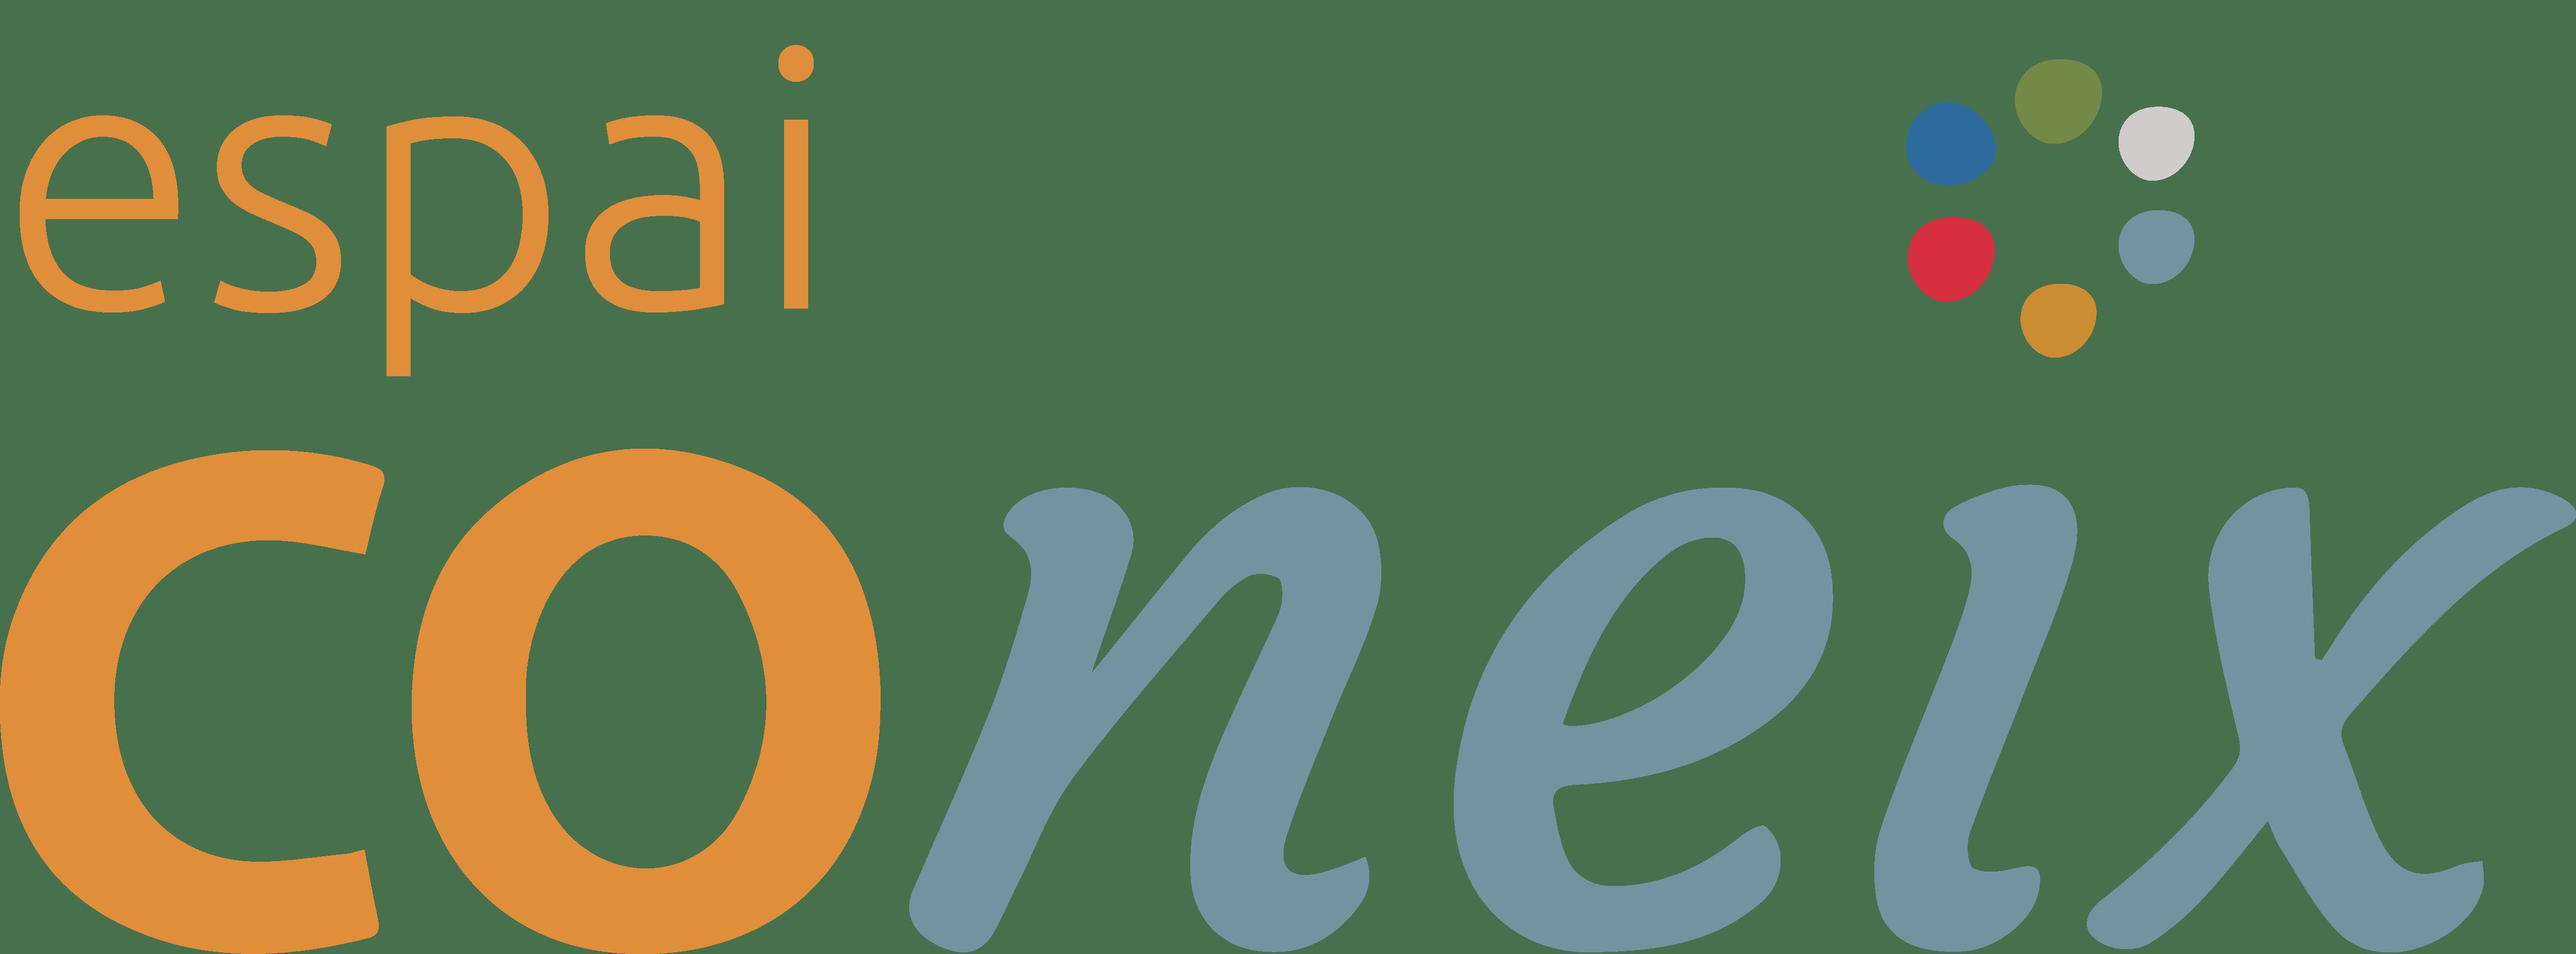 Logo espai coneix horizontal